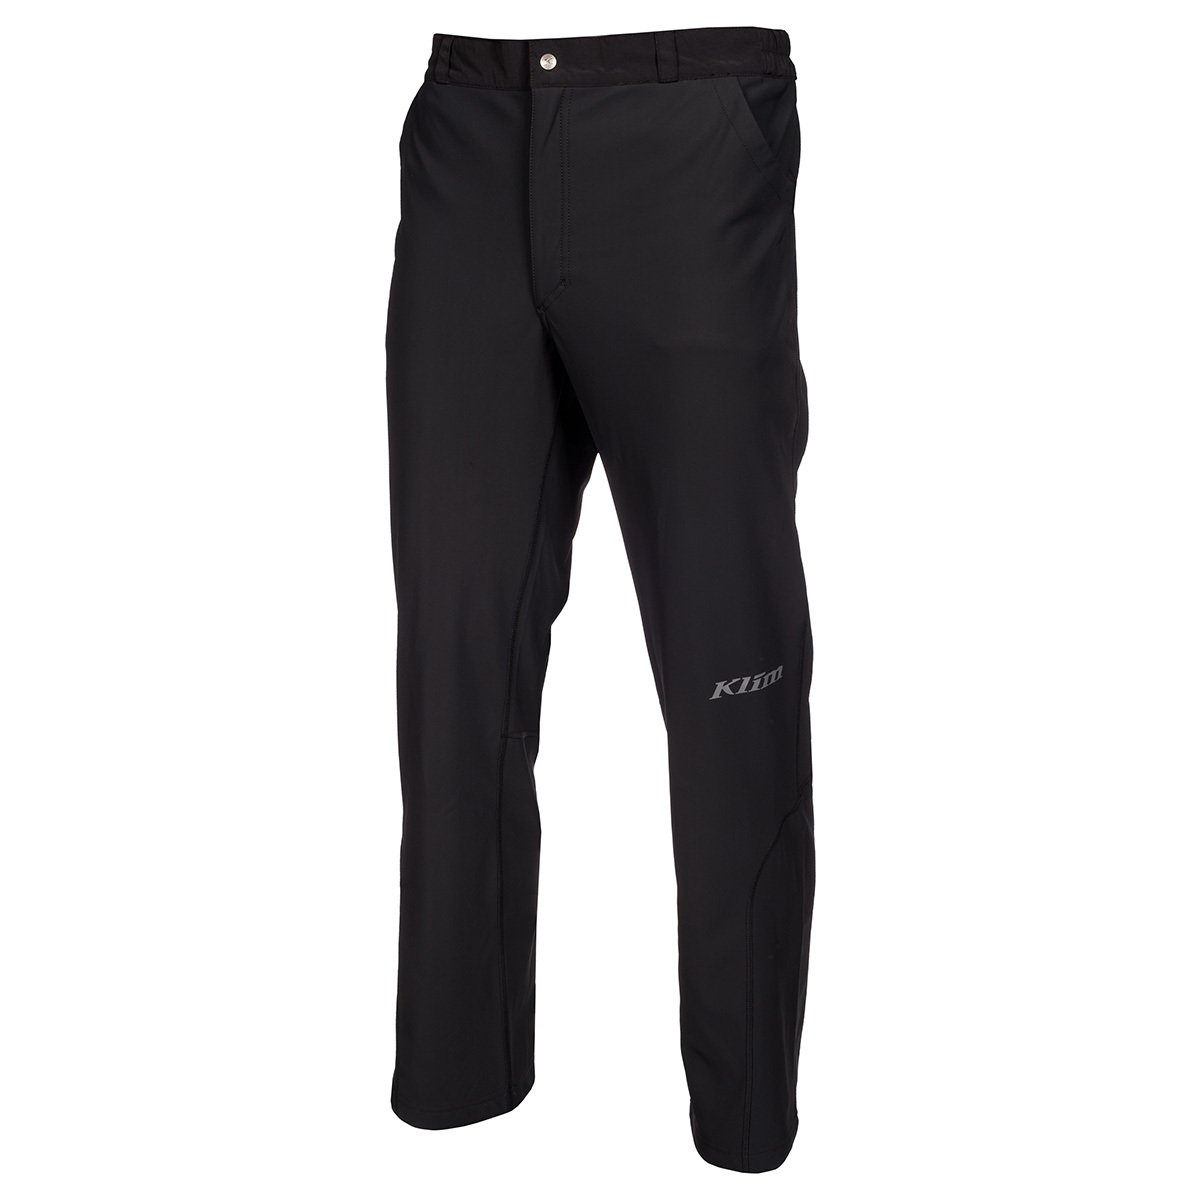 Klim Inferno Pant - Black/XXX-Large 3355-004-170-000